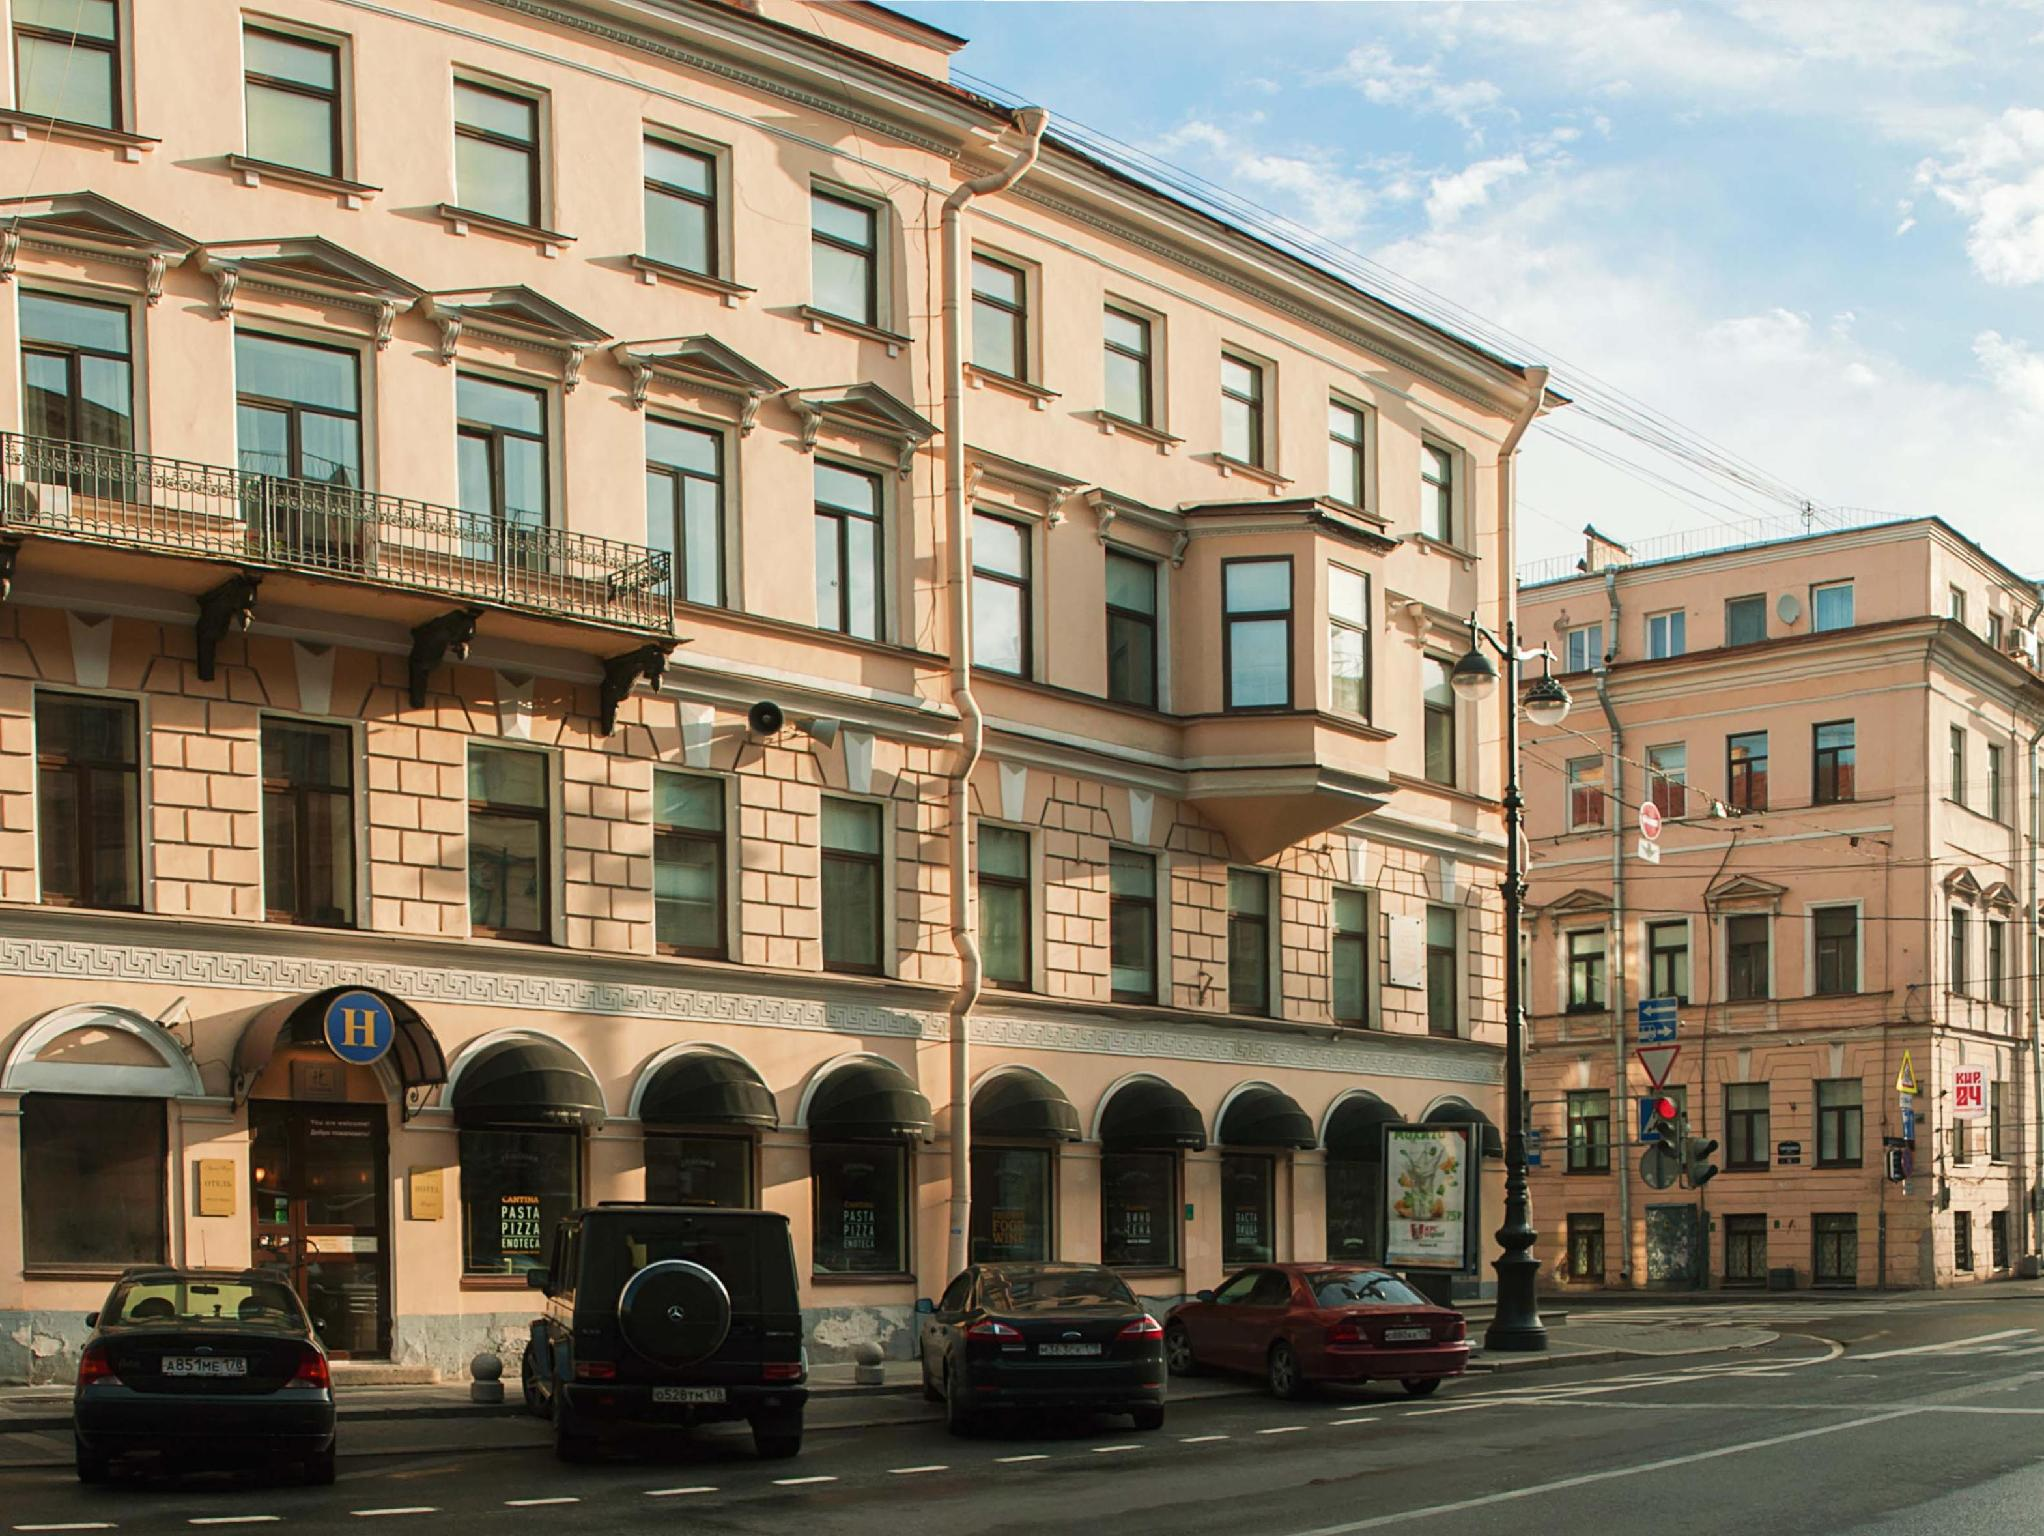 Polyclinic 17 Krasnogvardeisky district in St. Petersburg: address, description, reviews 45